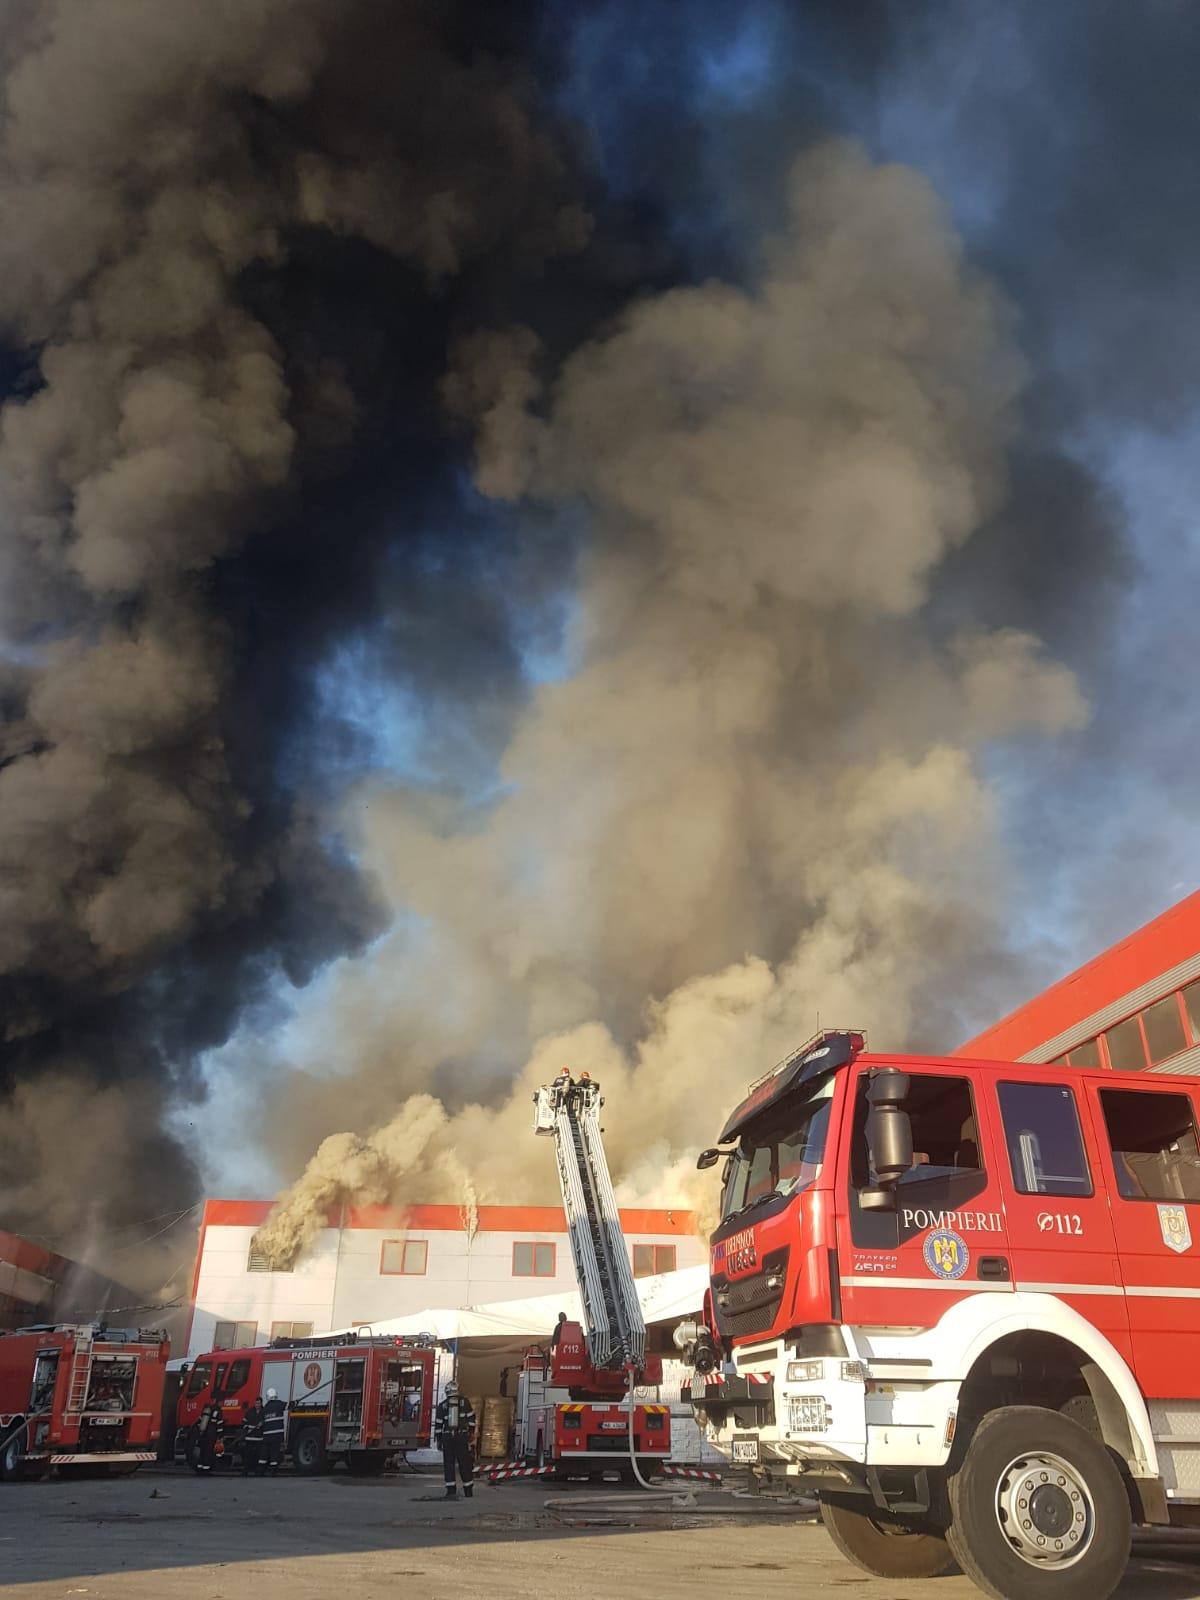 FOTO VIDEO Incendiu puternic la un depozit din Bragadiru ...  |Incendiu Bragadiru